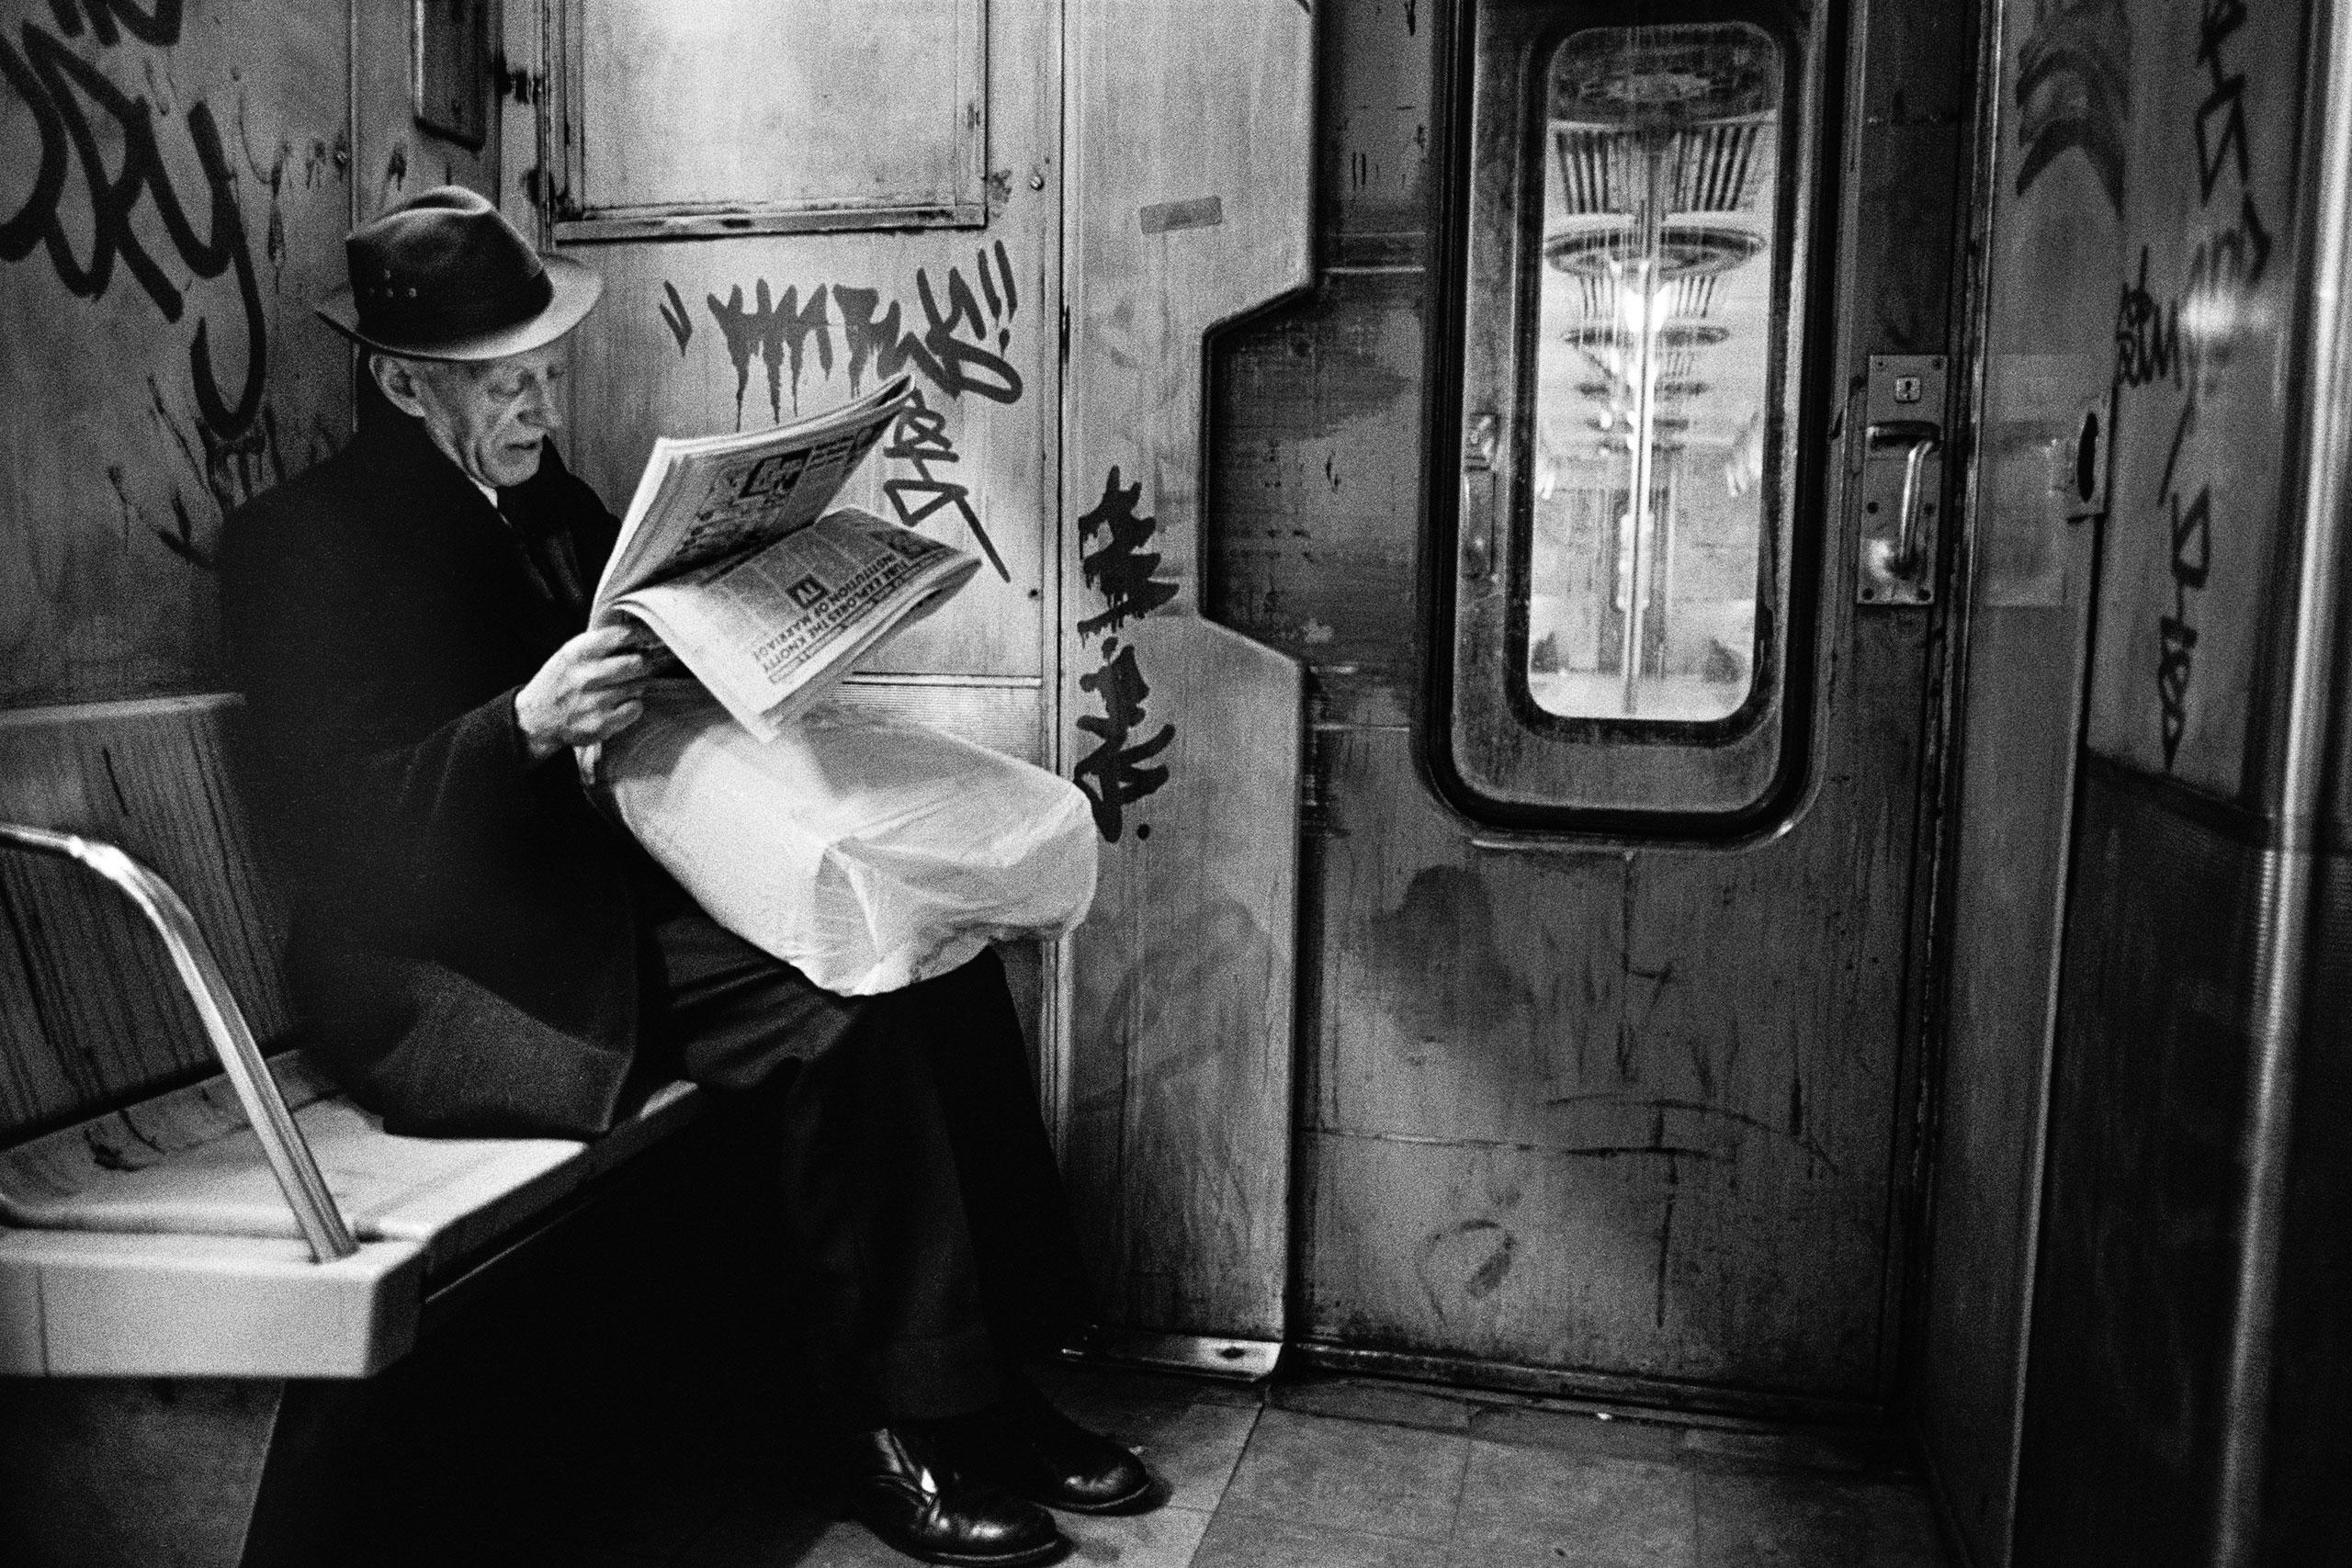 Subway Noir, NYC, 1986